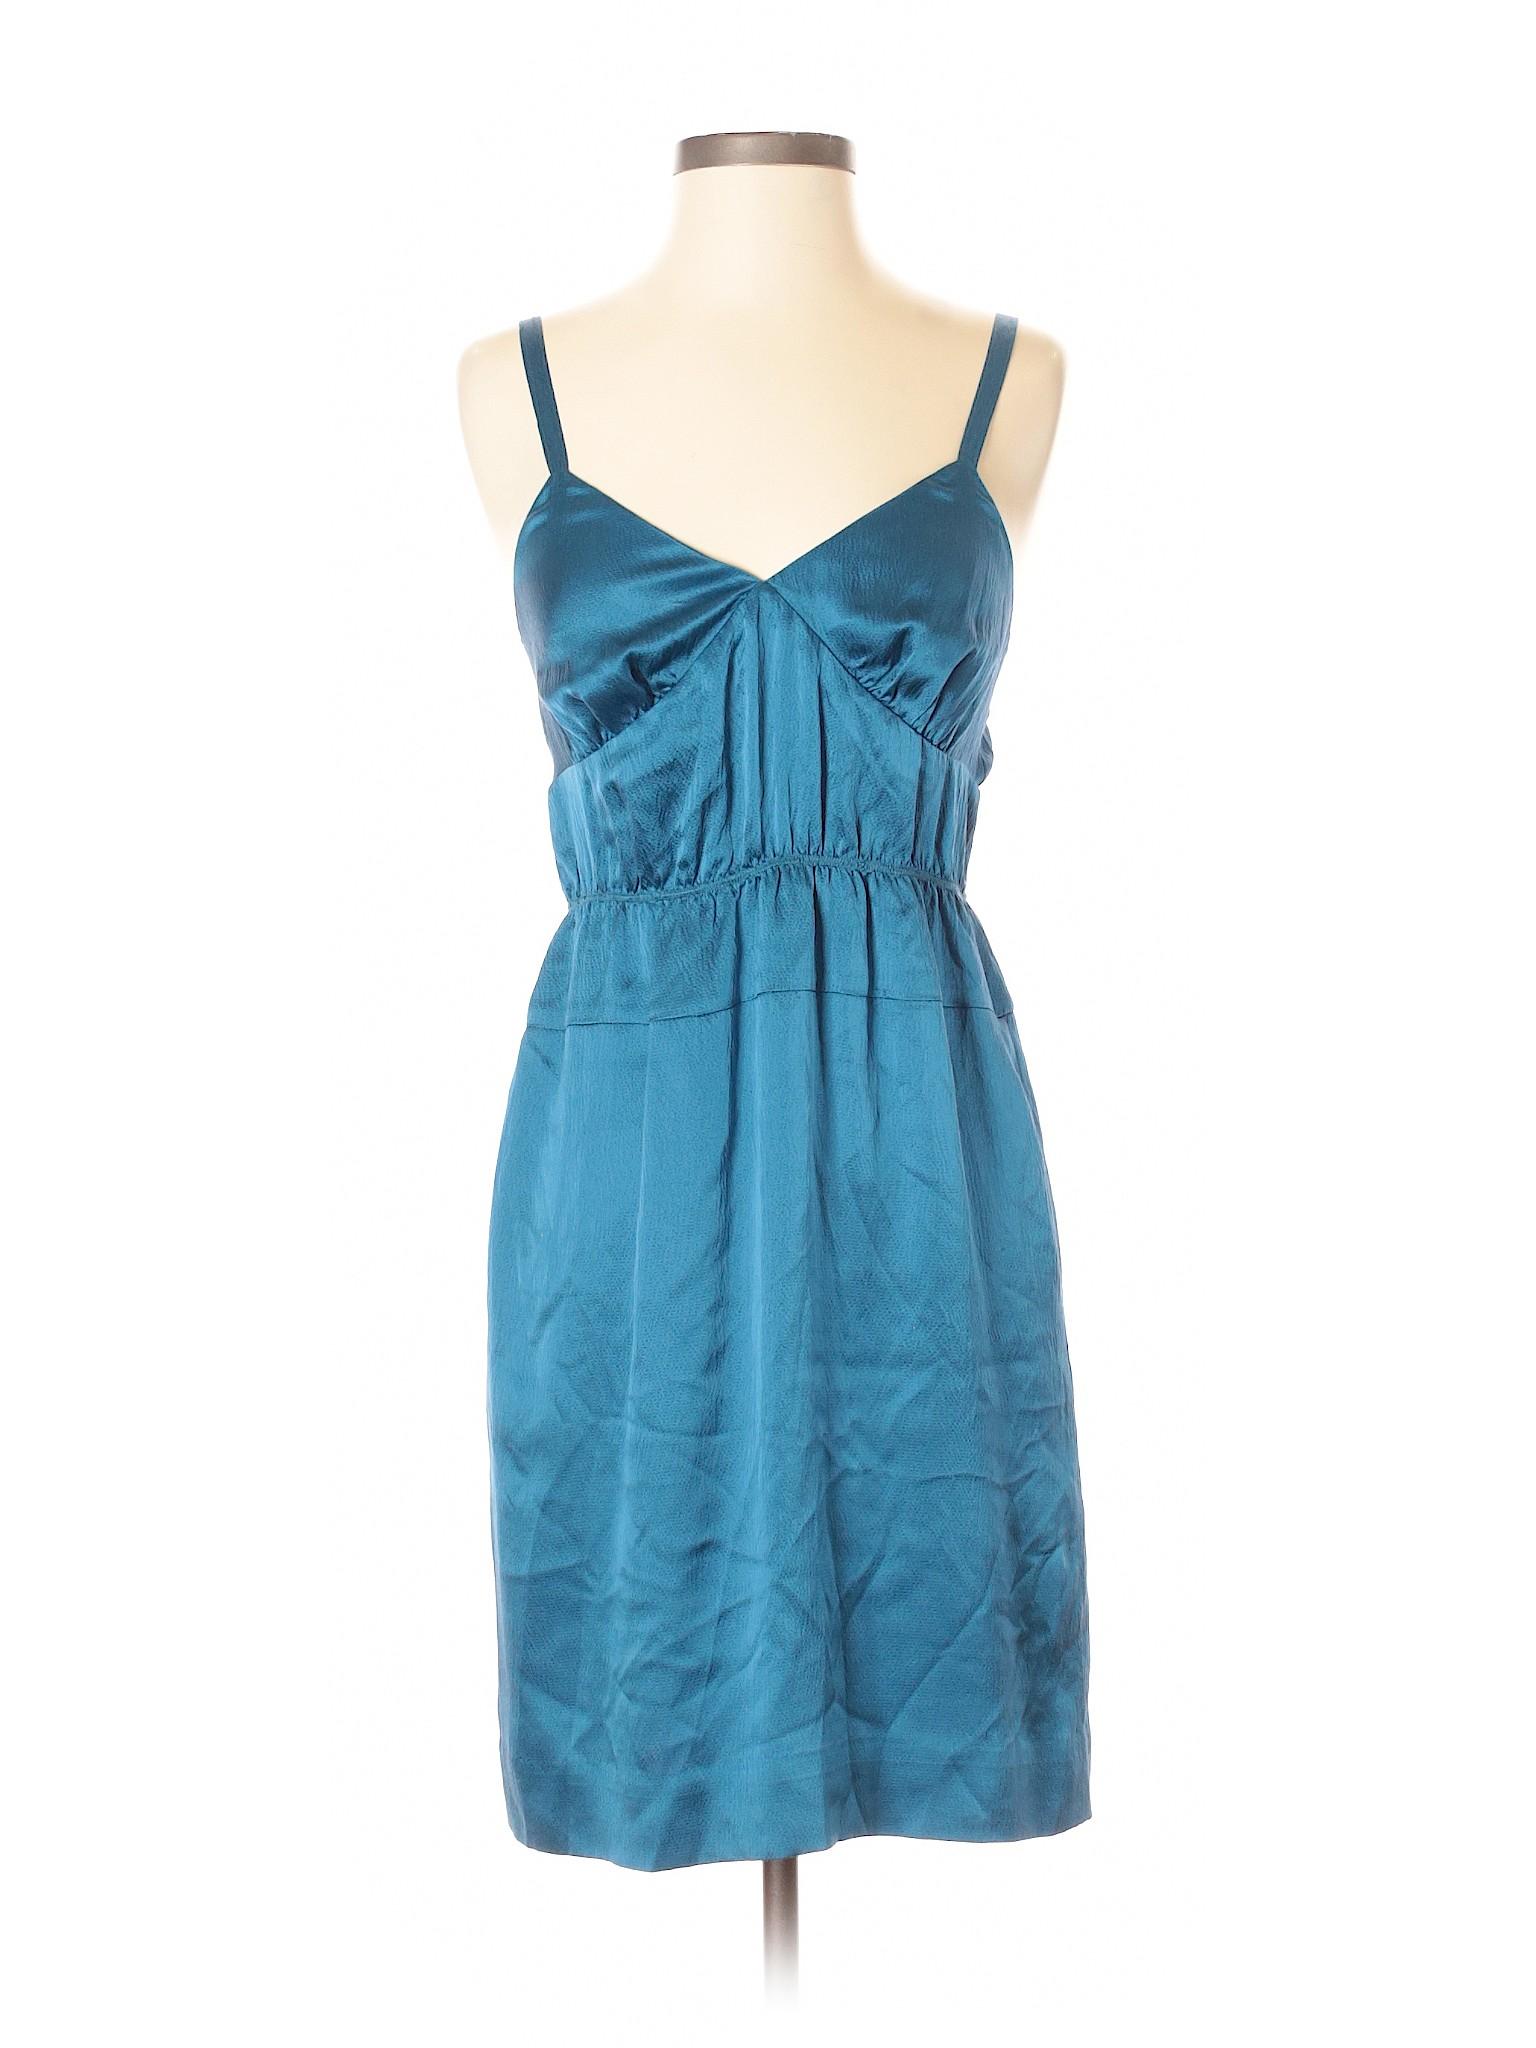 Casual Selling Crew Crew Dress Dress J Casual J Selling 4a7qwf4